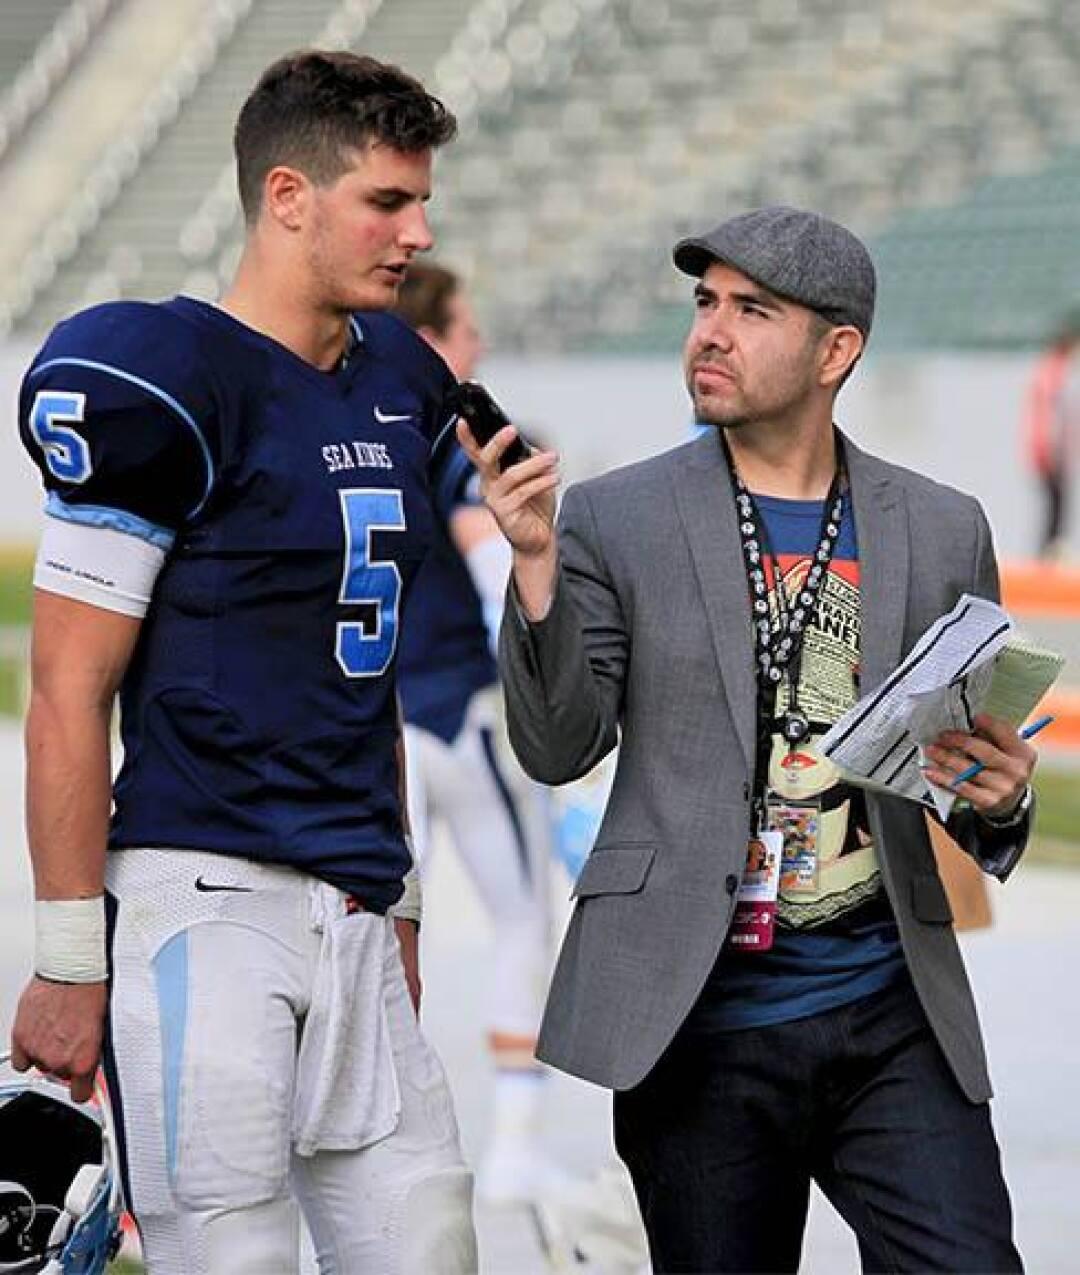 David Carrillo Peñaloza interviewing Corona del Mar High School quarterback Luke Napolitano.